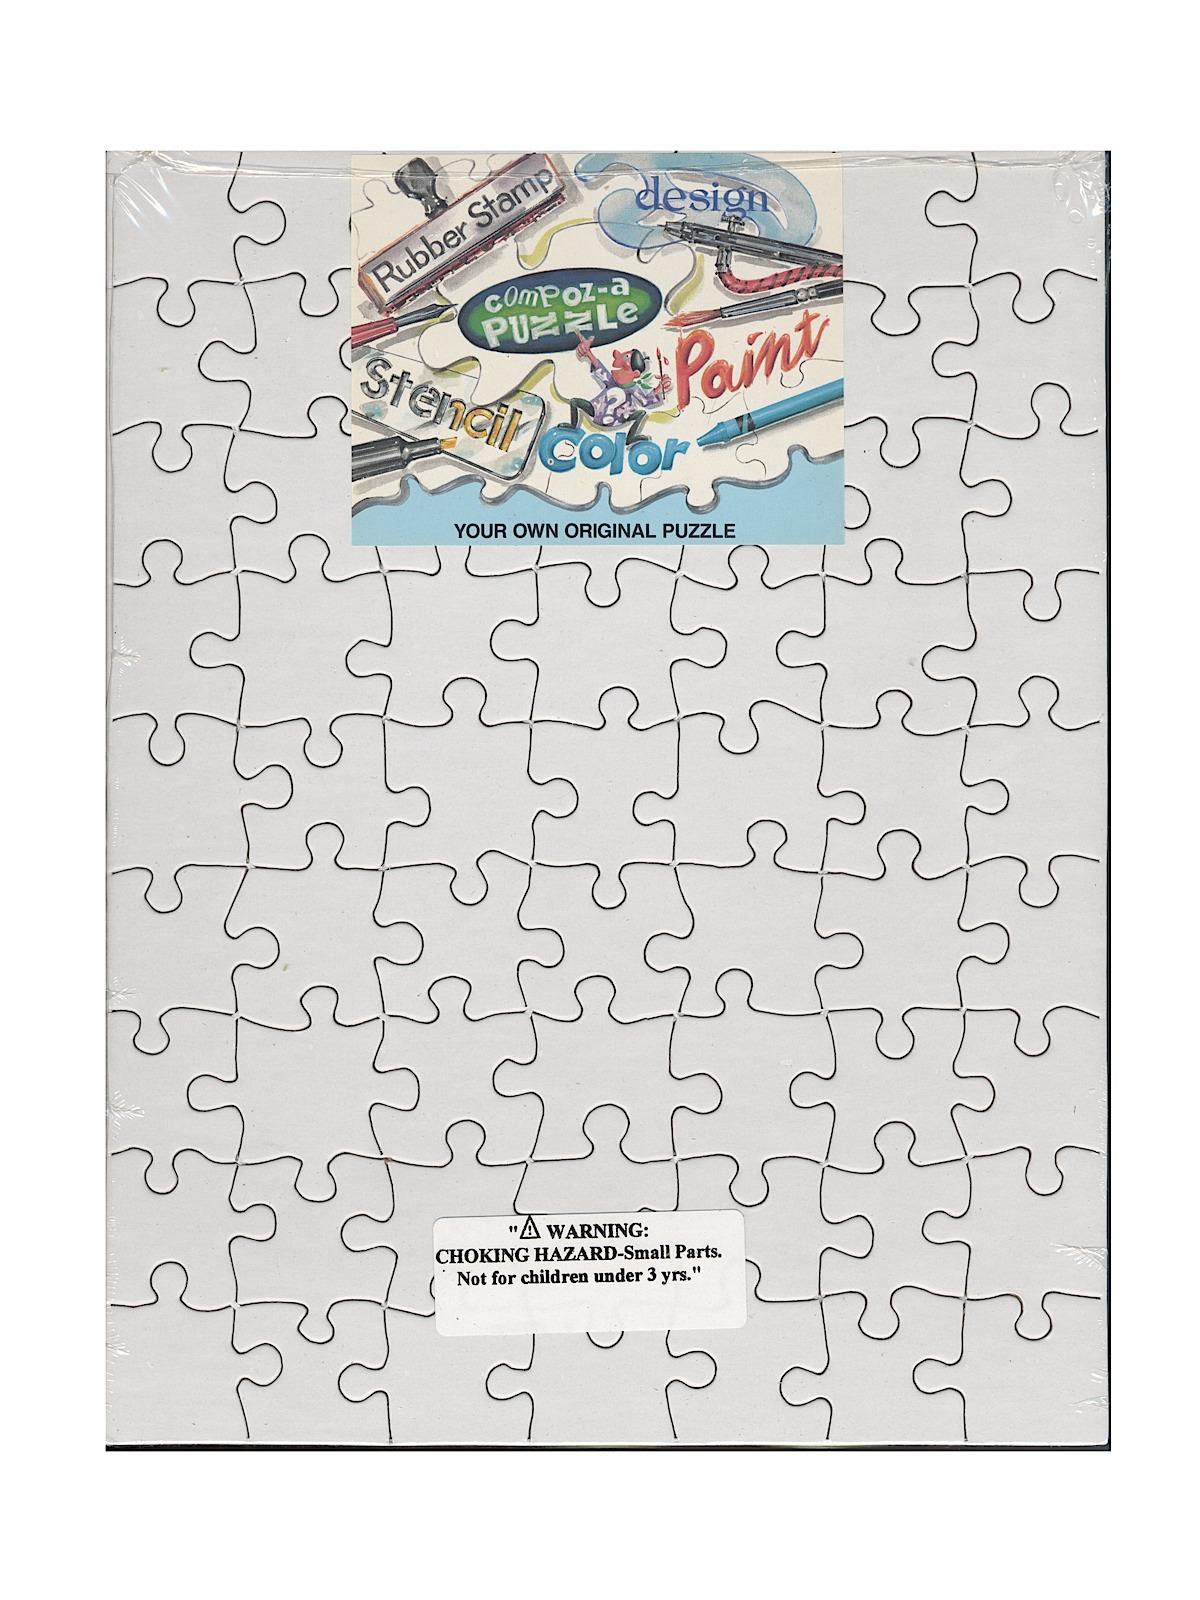 Compoz A Puzzle Blank Puzzles